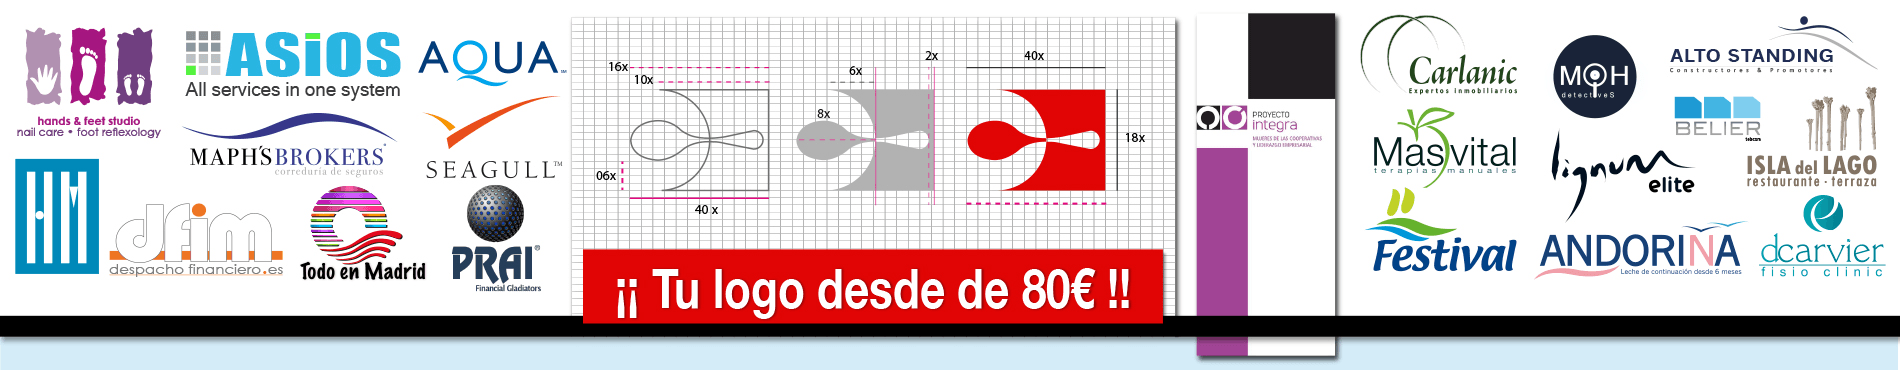 slider_logotipo-2